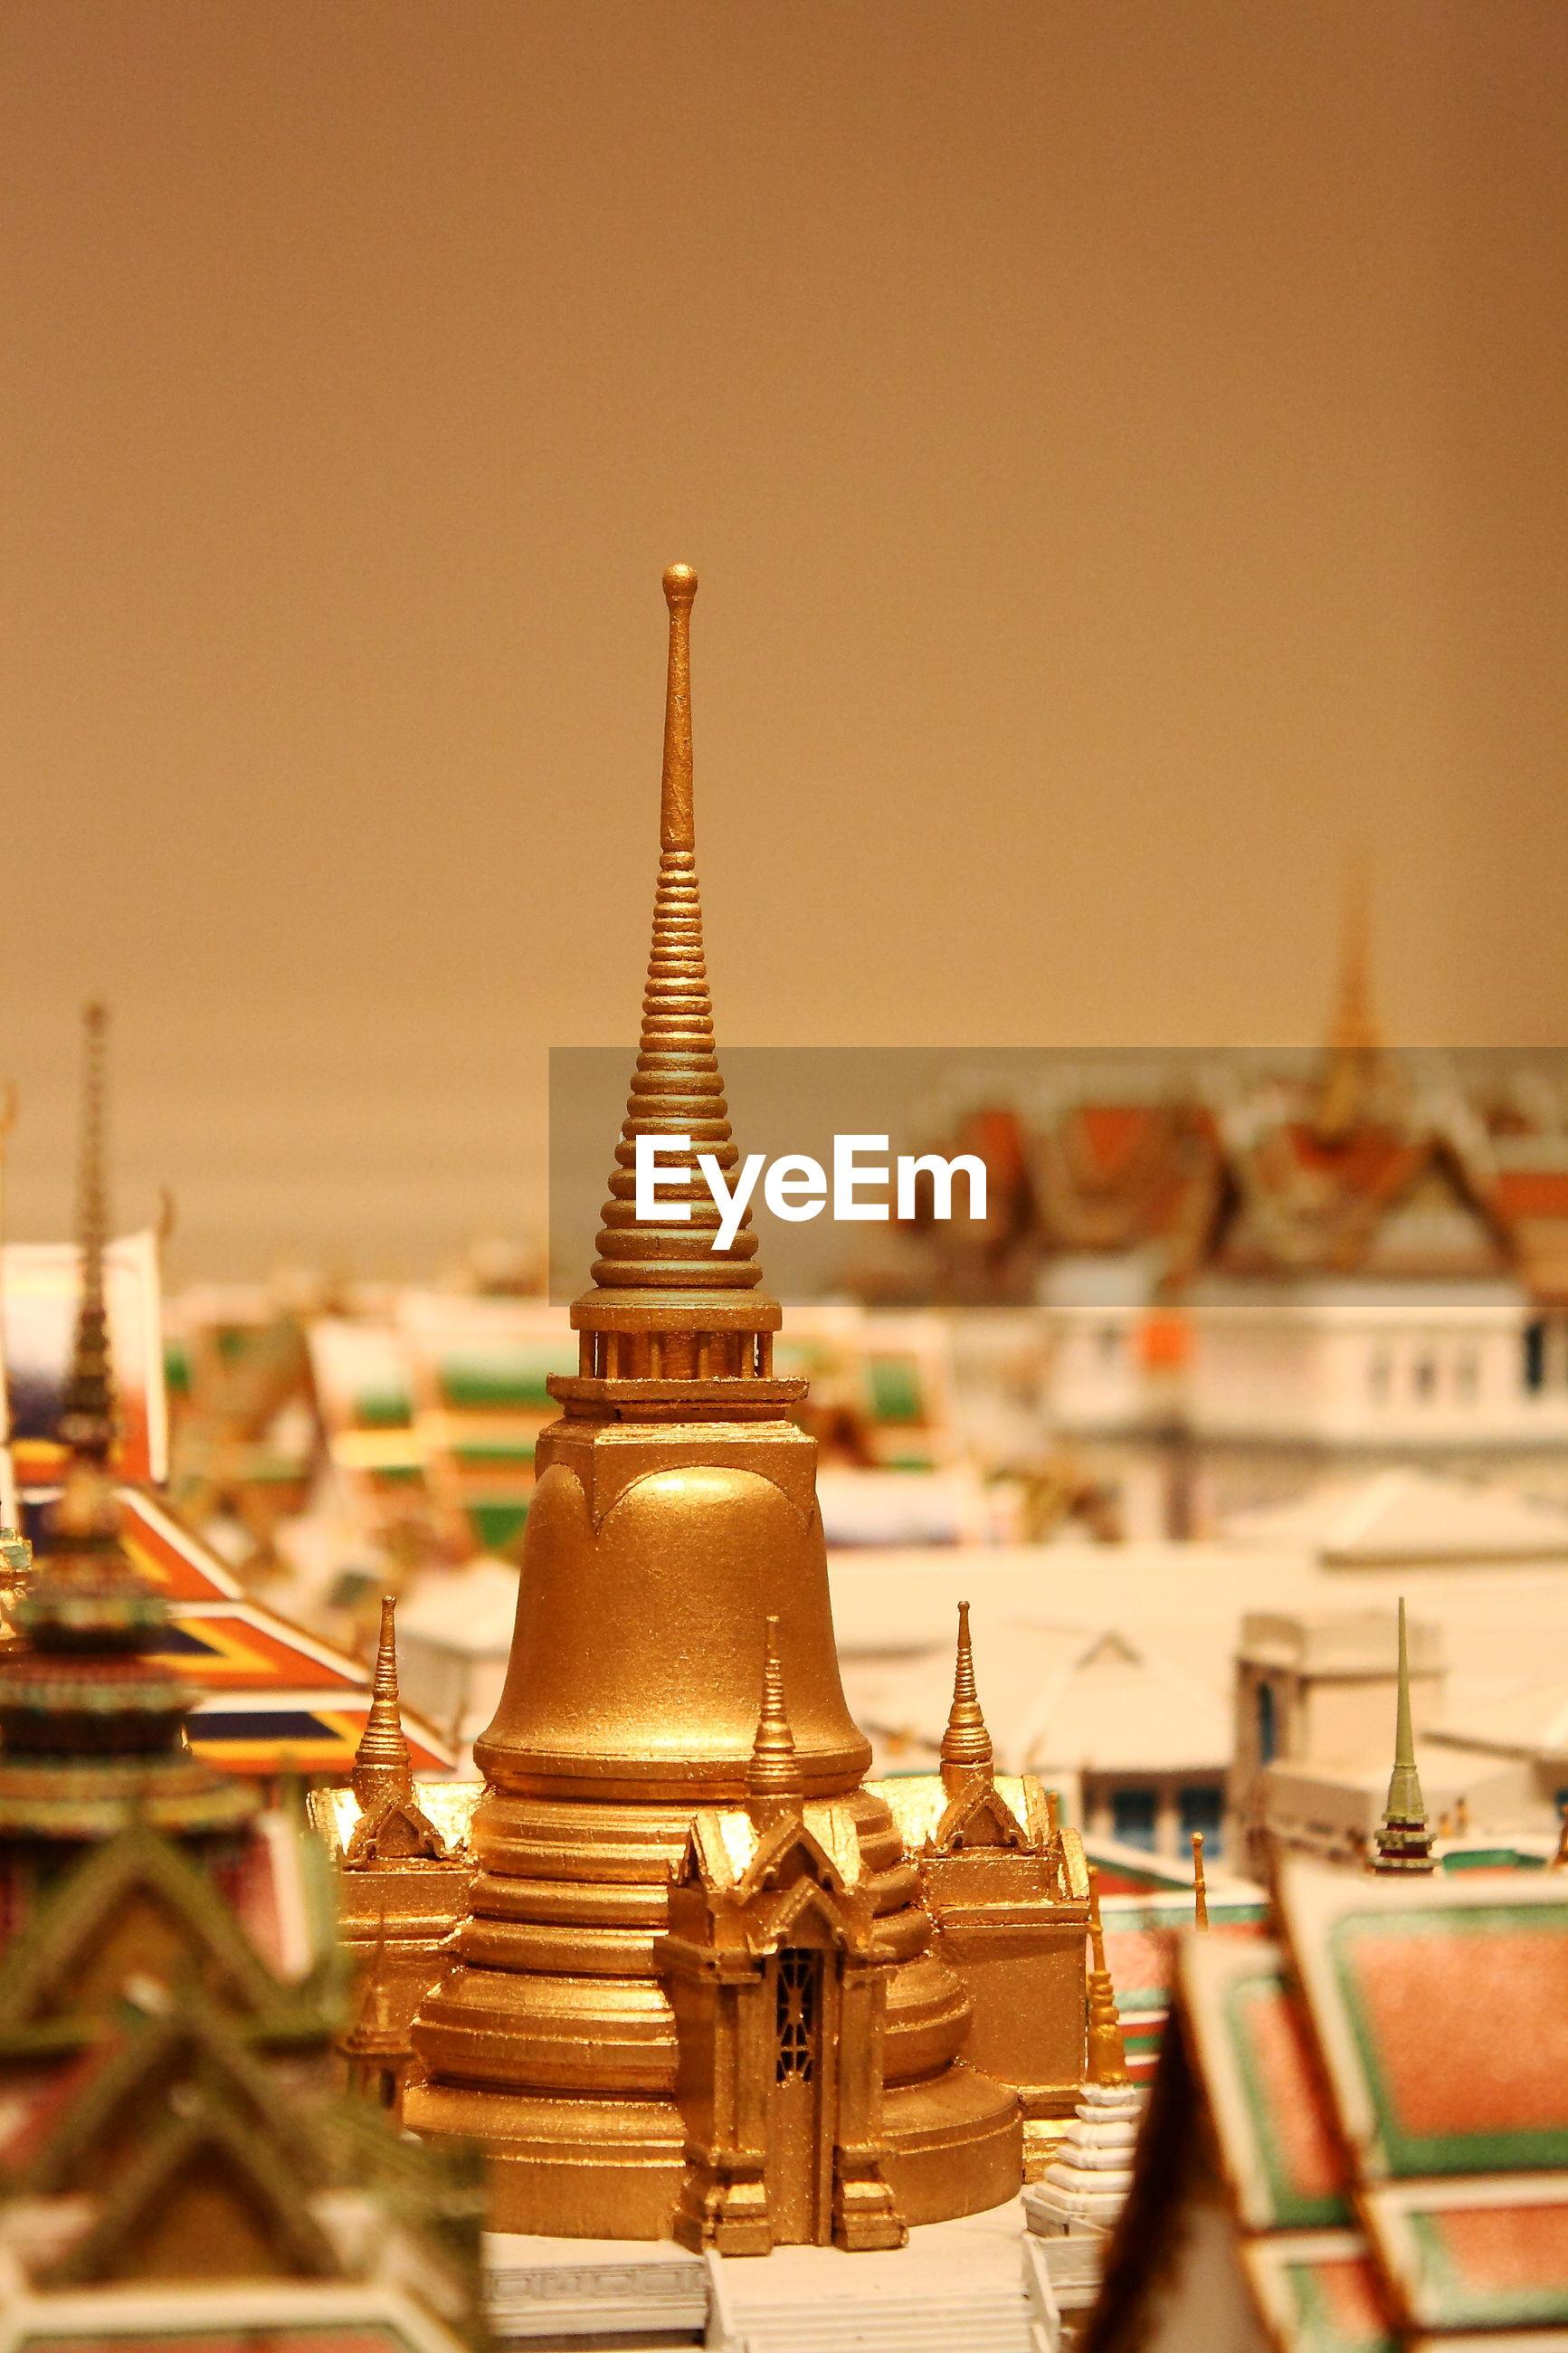 Close-up of wat phra kaew model at museum